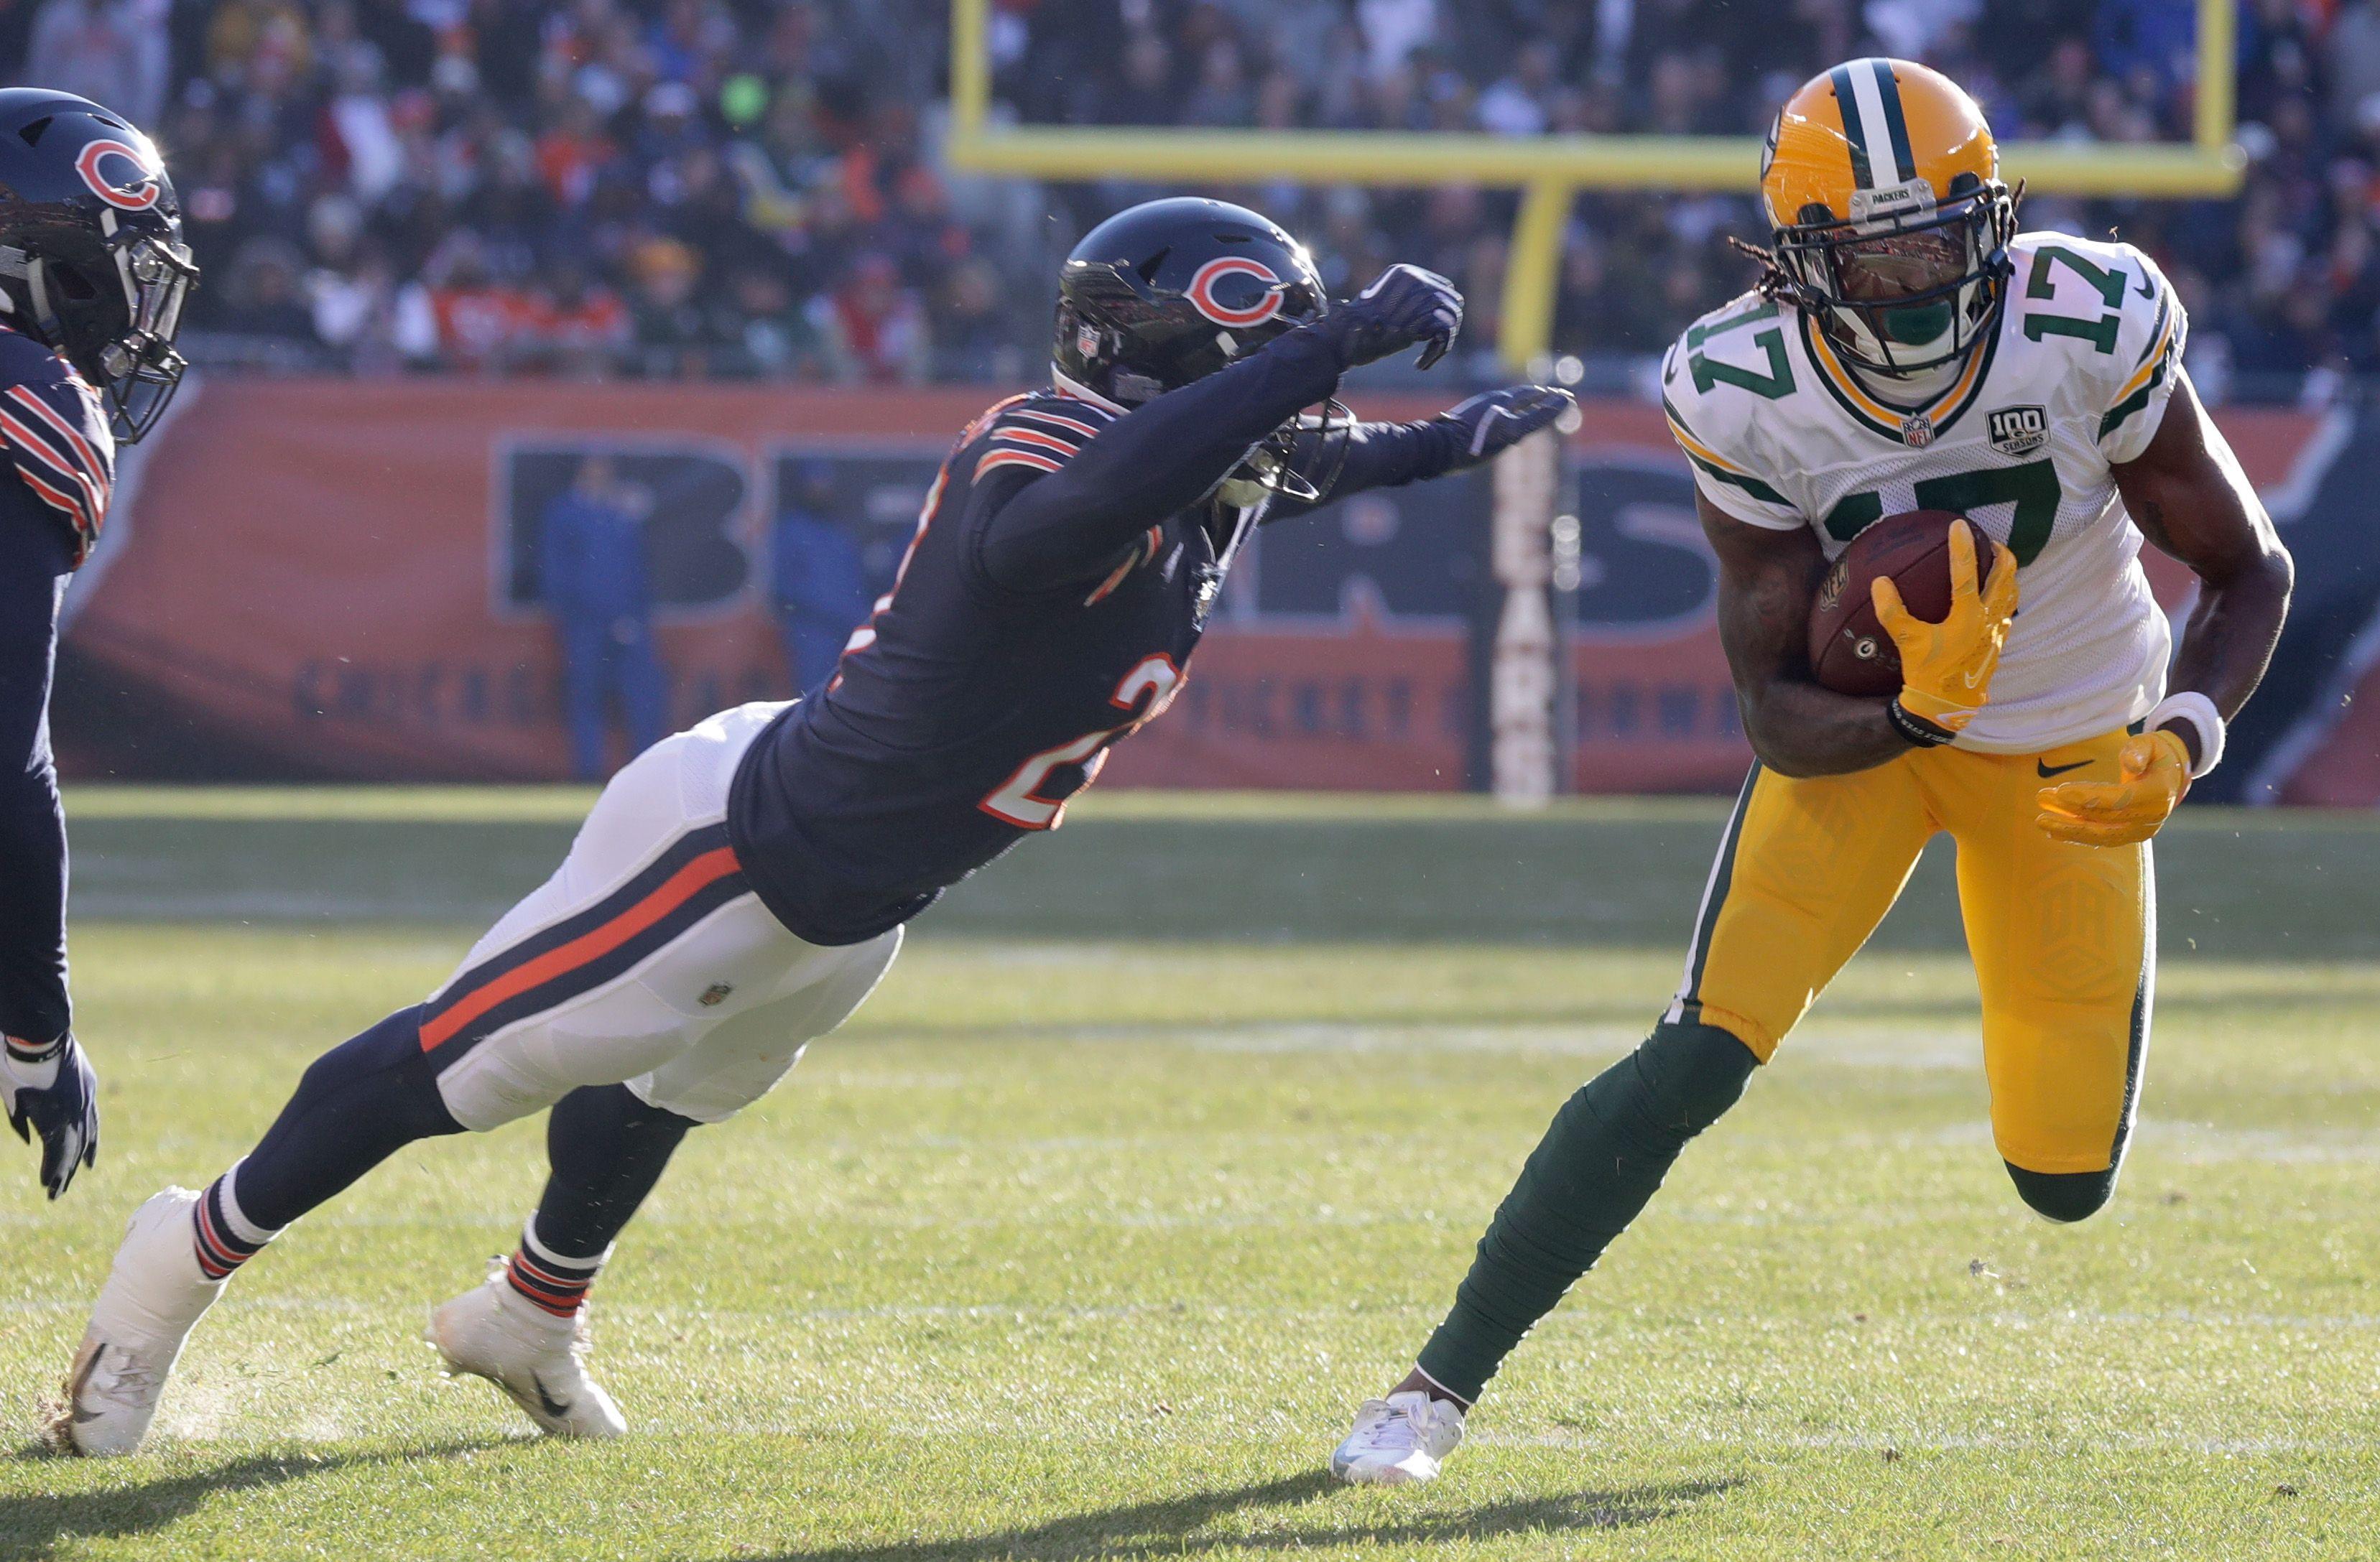 Six Key Factors That Will Determine the Winner of the Packers-Bears in Week 6